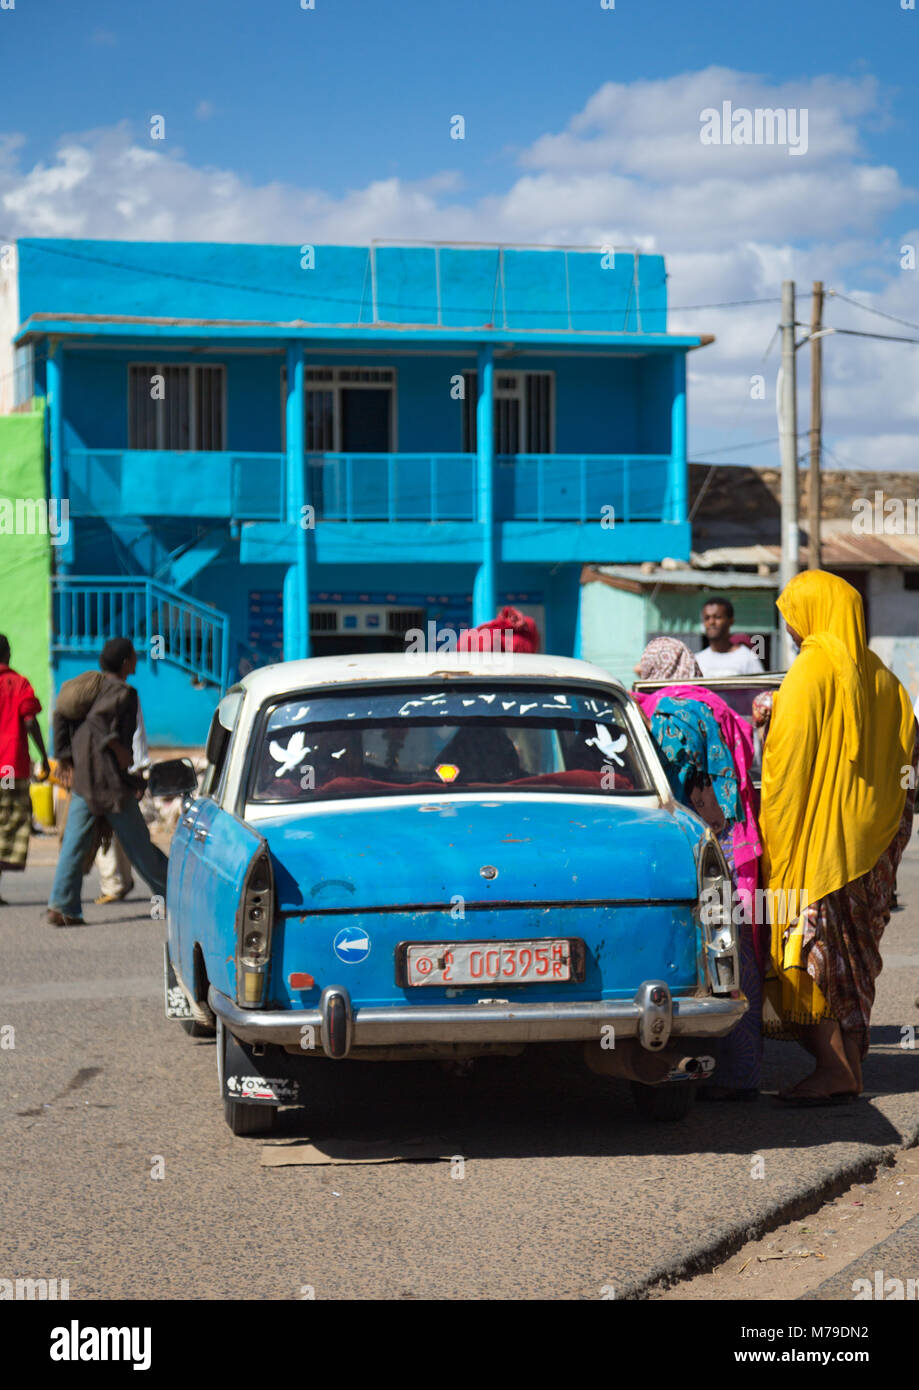 Harari famous peugeot 404 taxi in the old town, Harari region, Harar, Ethiopia - Stock Image